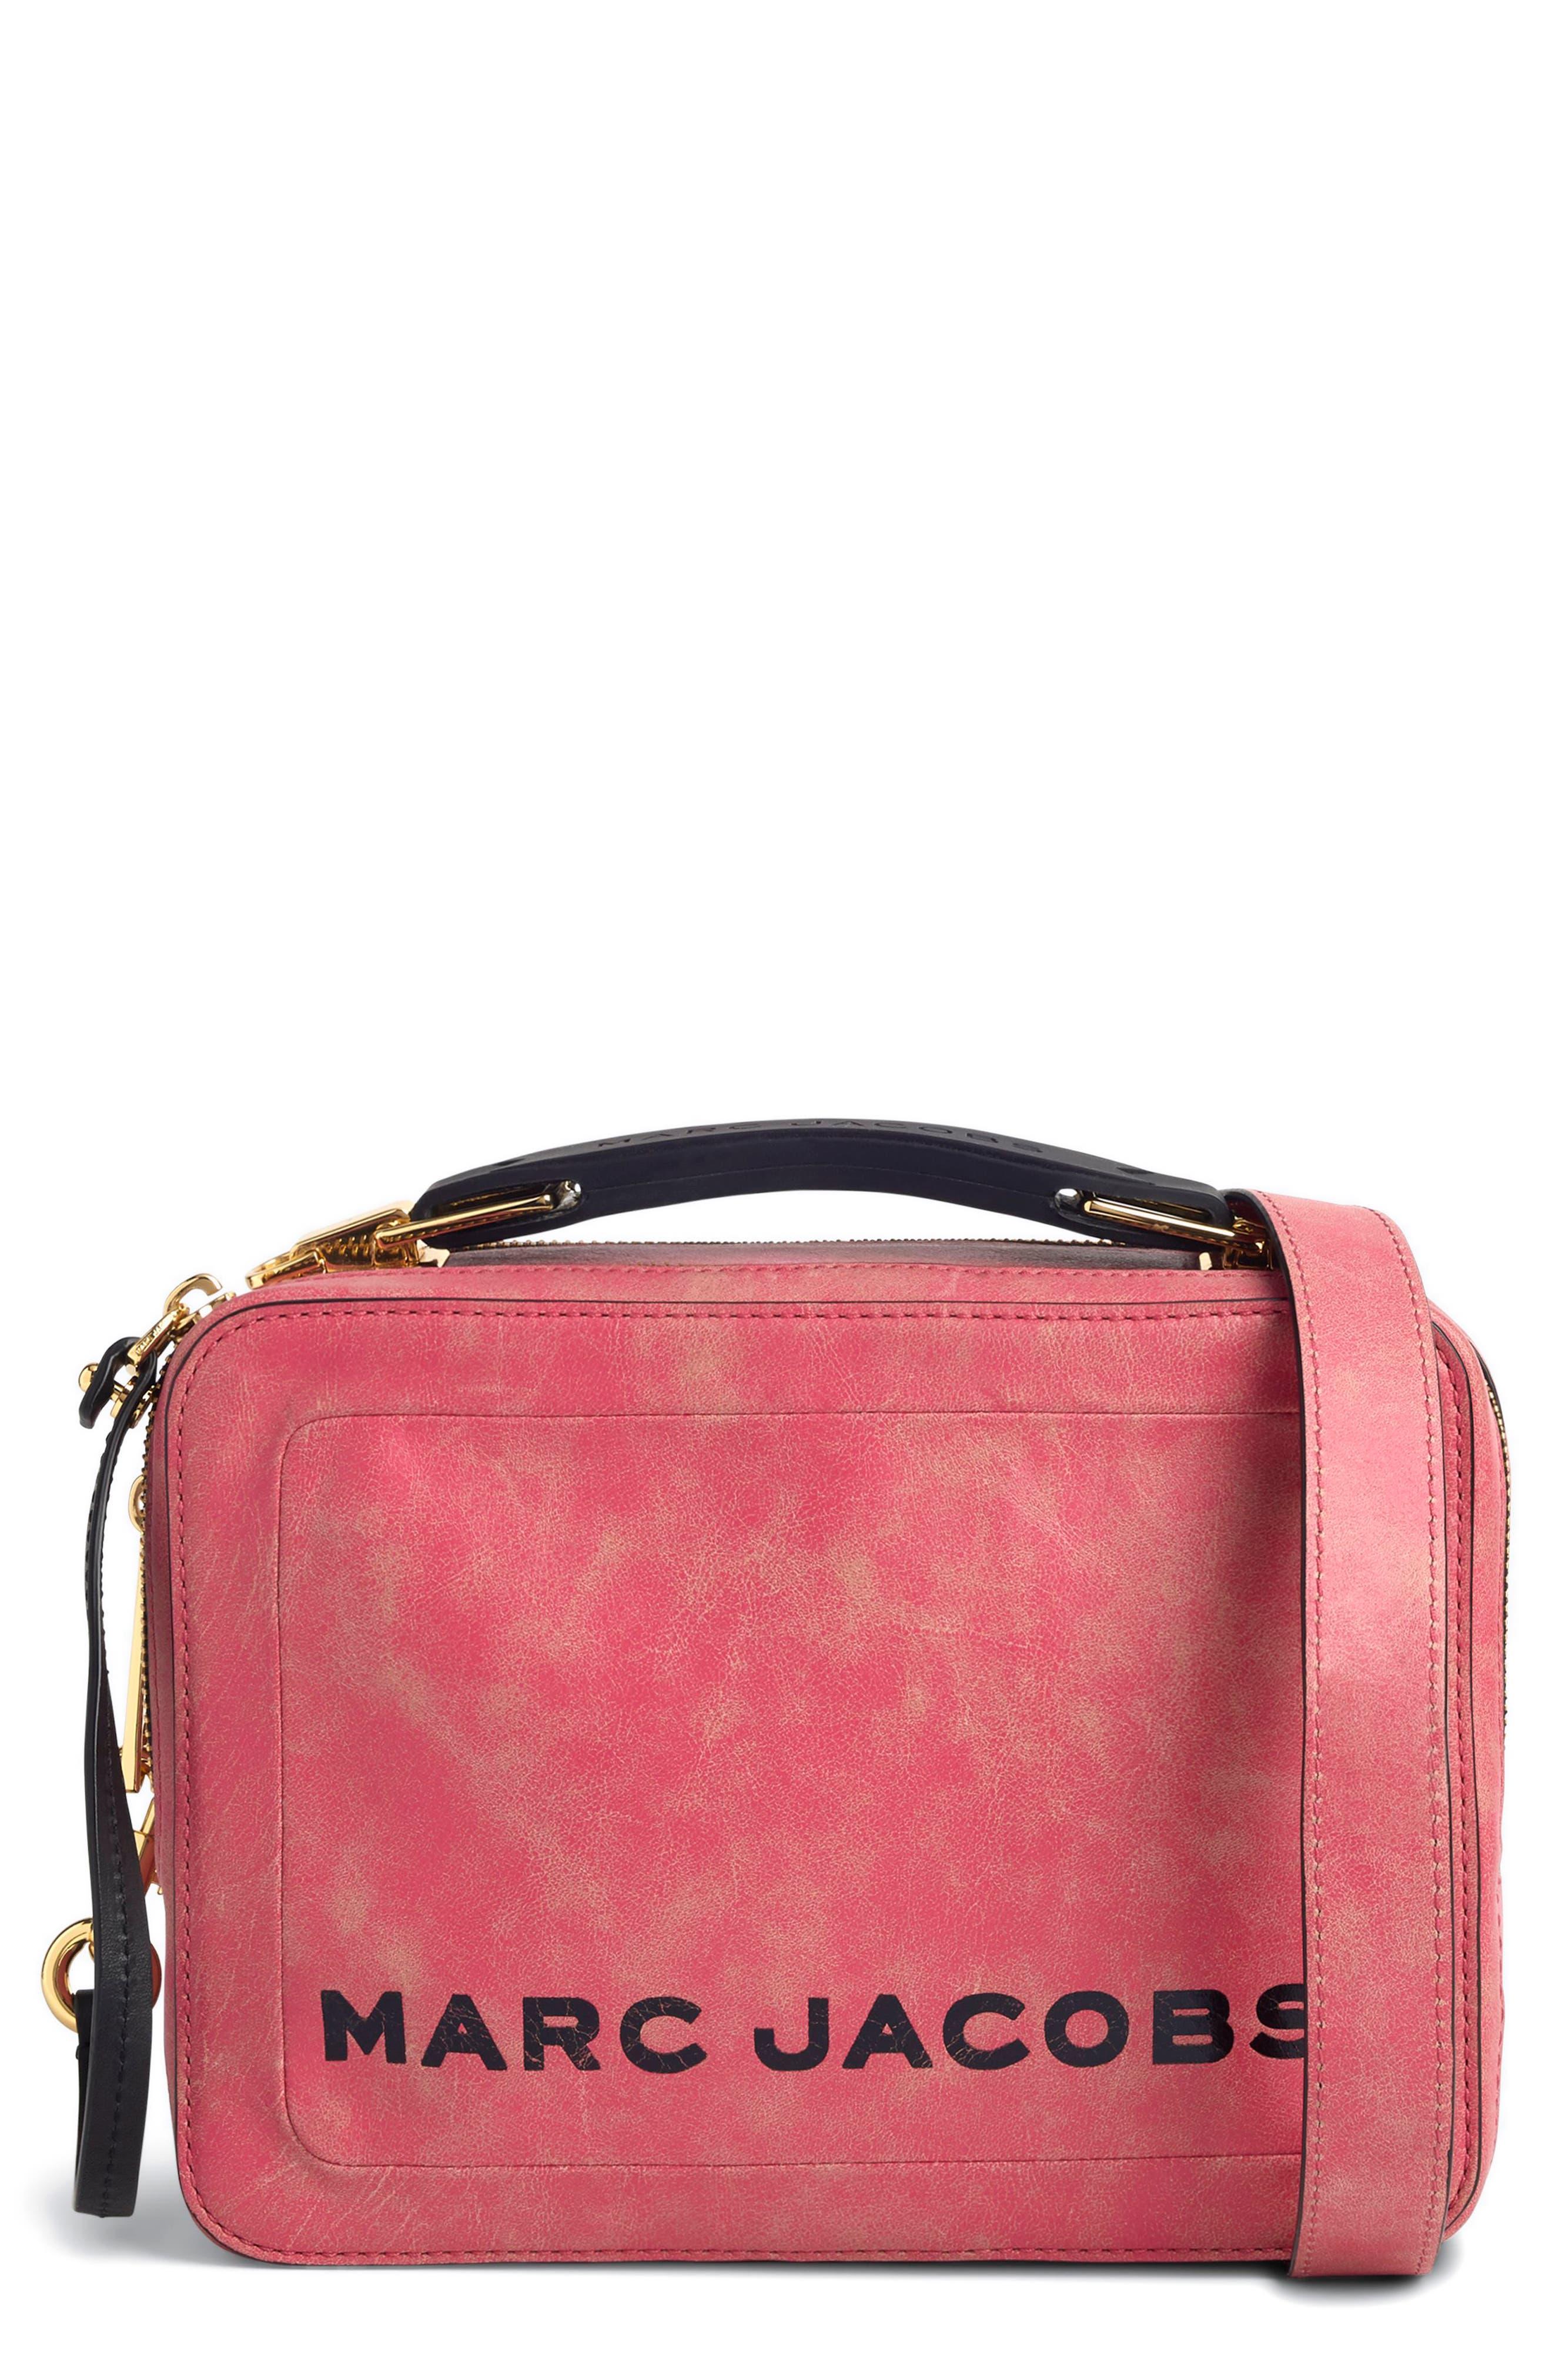 The Box Leather Handbag,                             Main thumbnail 1, color,                             PEONY